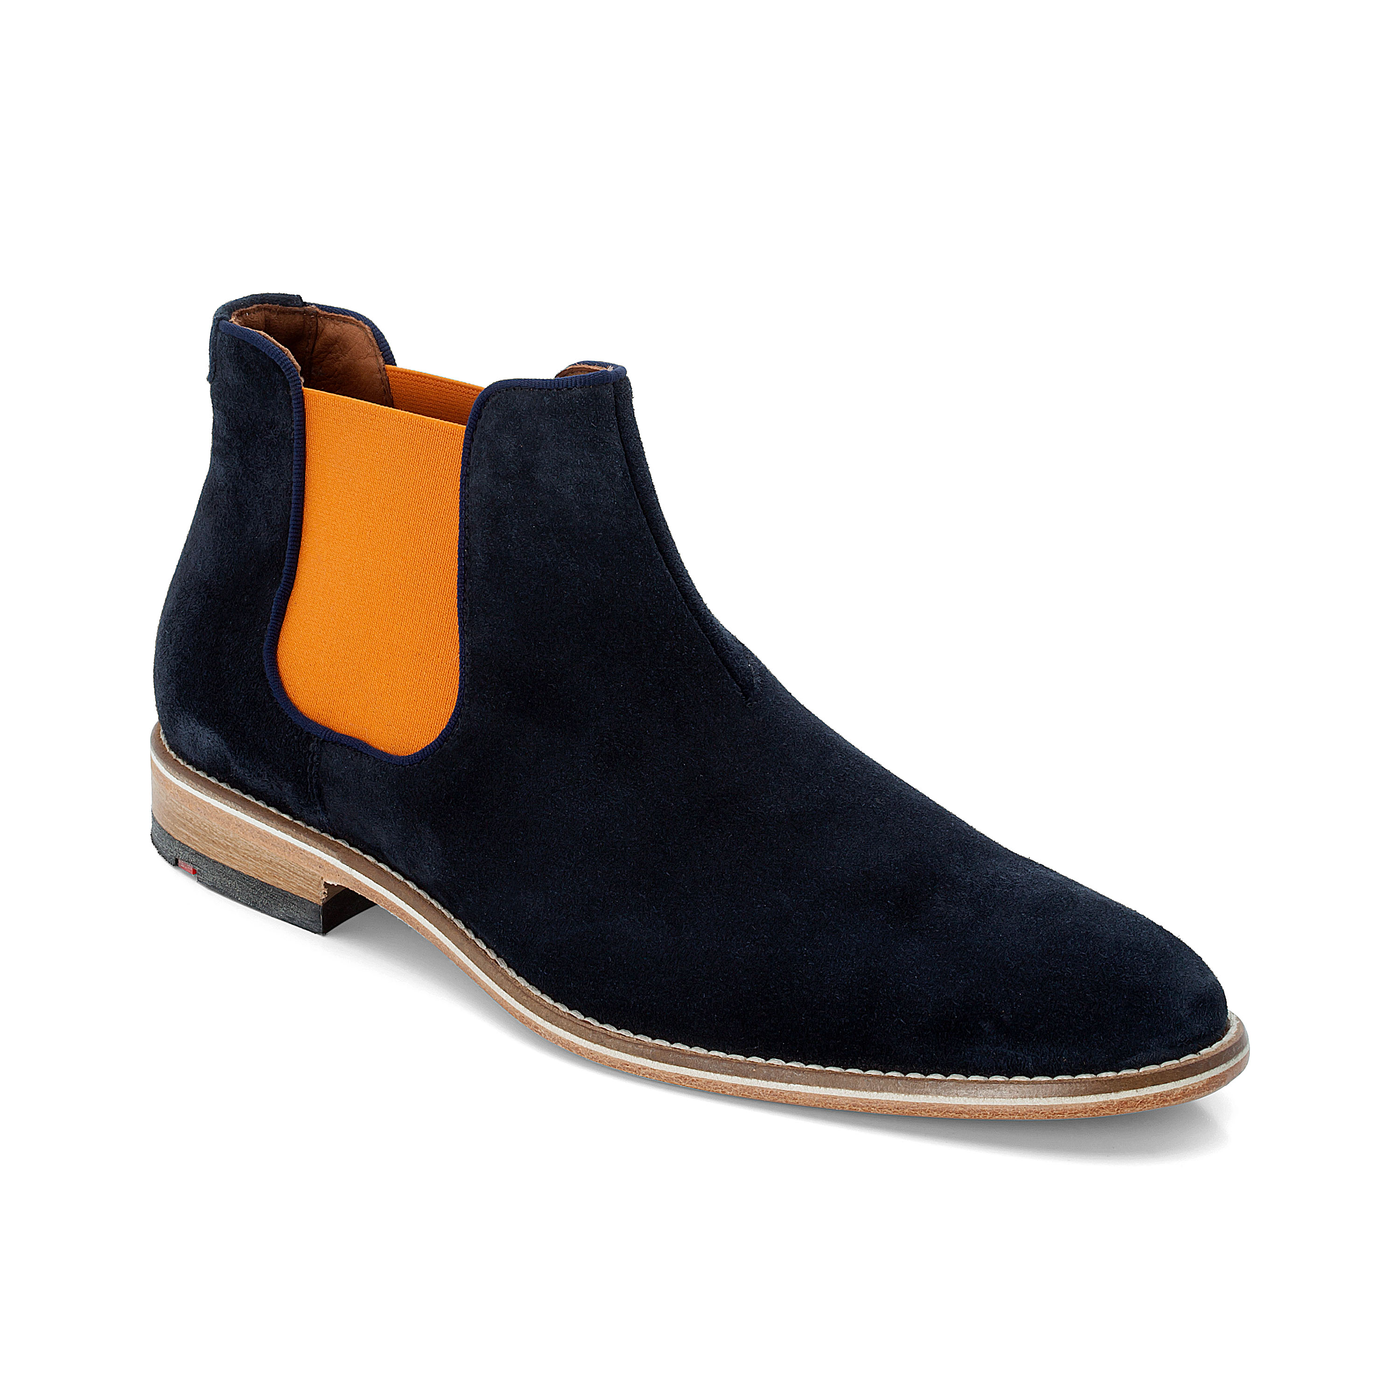 GERSON | Schuhe > Boots > Chelsea-Boots | Lloyd